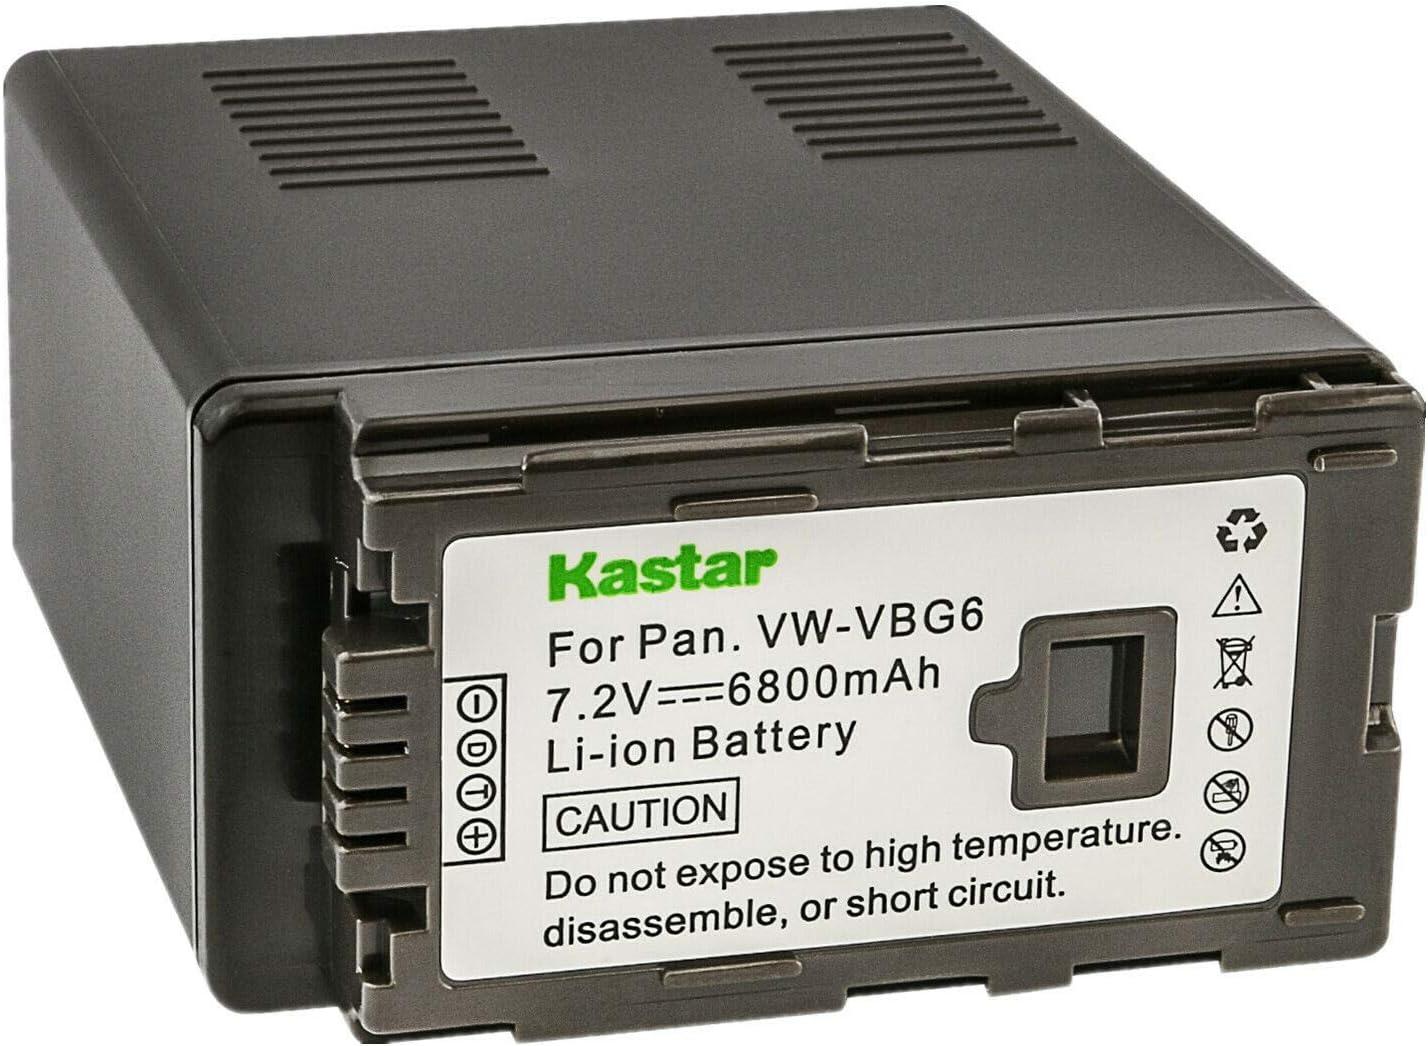 PC Parts Unlimited B133XW03V.1-CC Grade AUO 13.3 Slim WLED Backlight 1366 x 768 WXGA 40 Pin LVDSC Grade